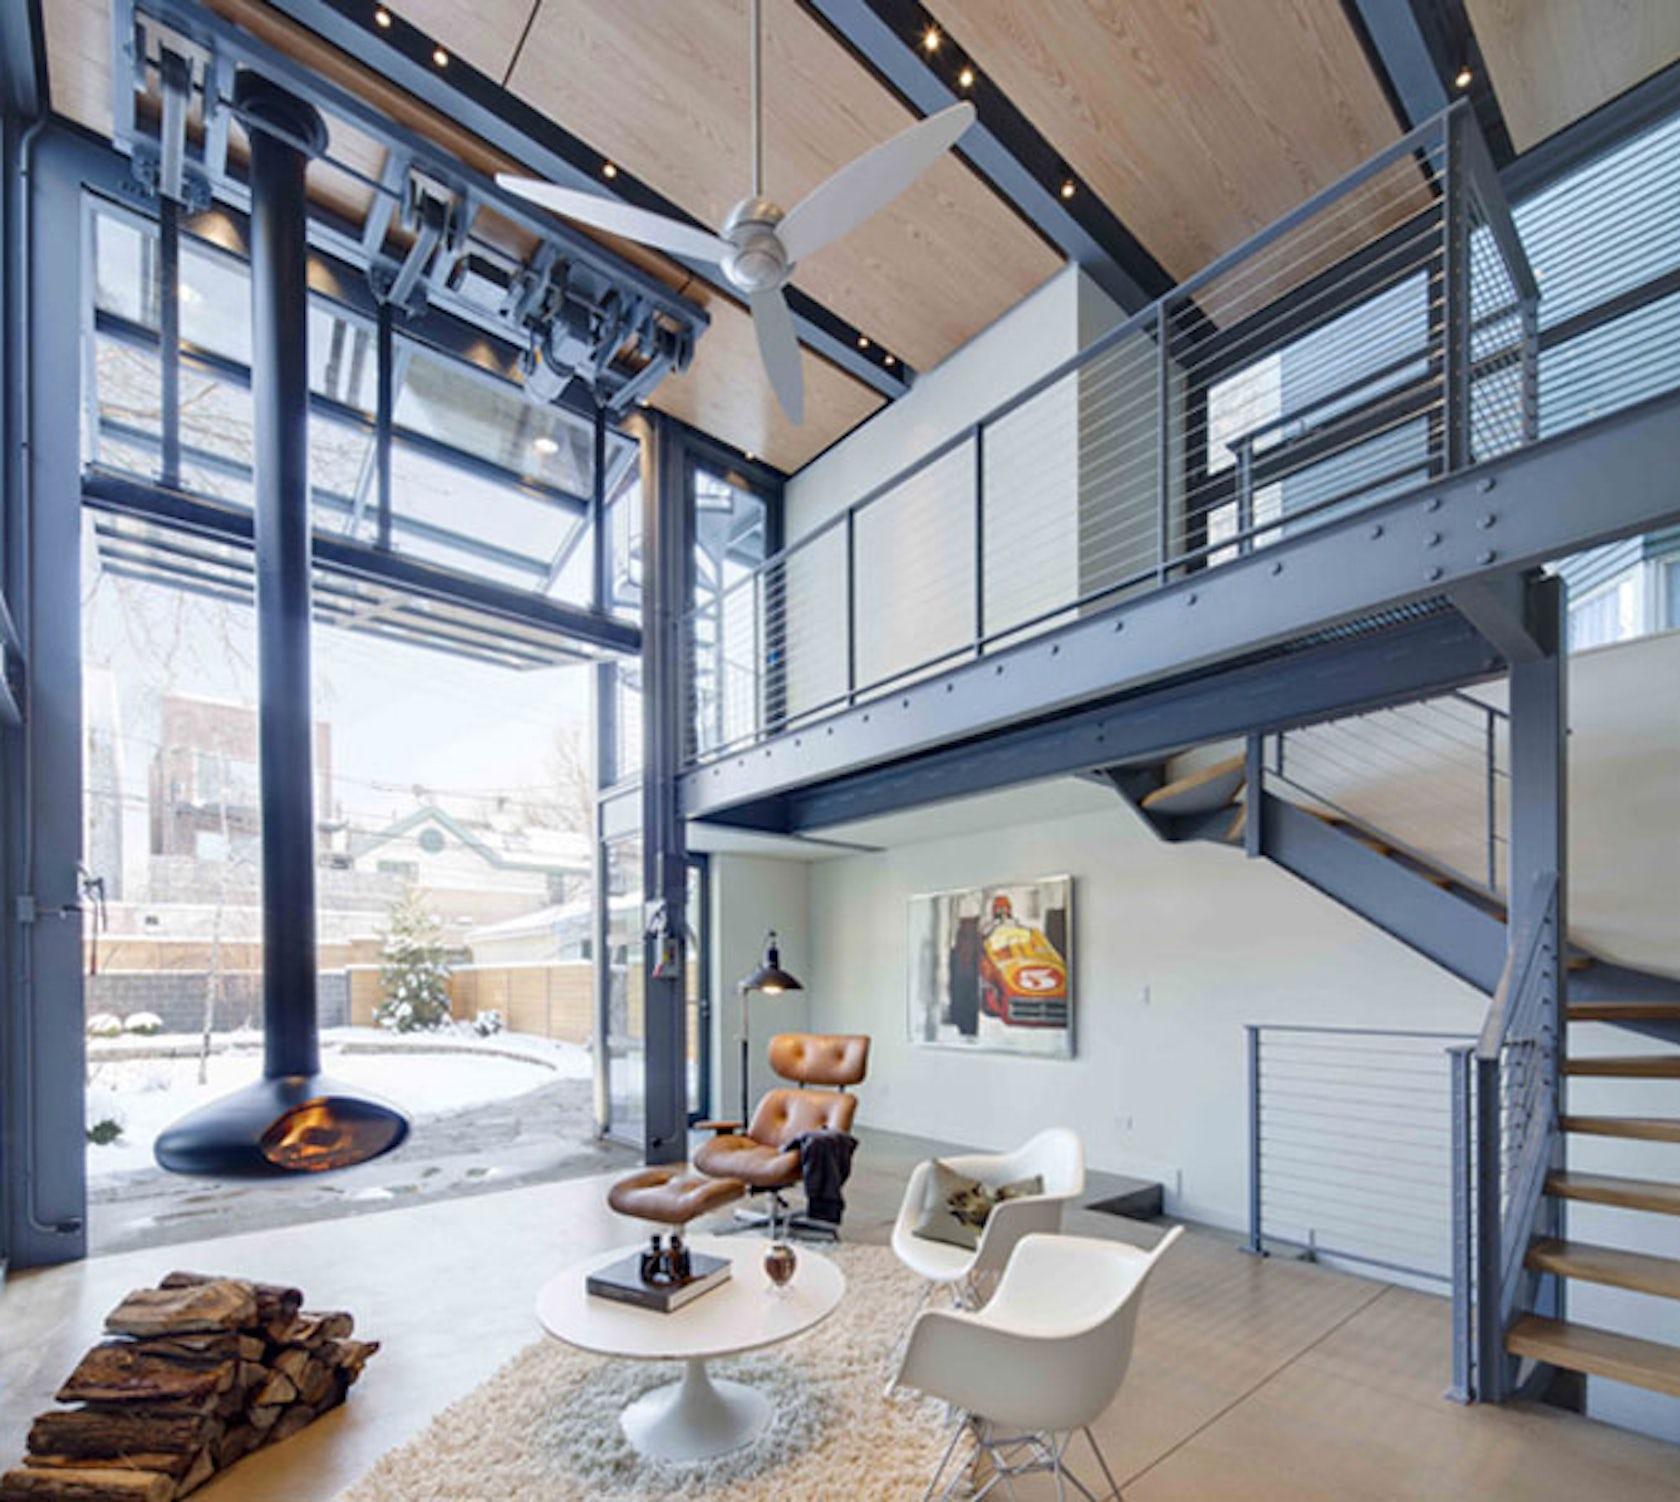 Awesome Hi Tech Loft Wohnung Loft Dethier Architecture Gallery ...